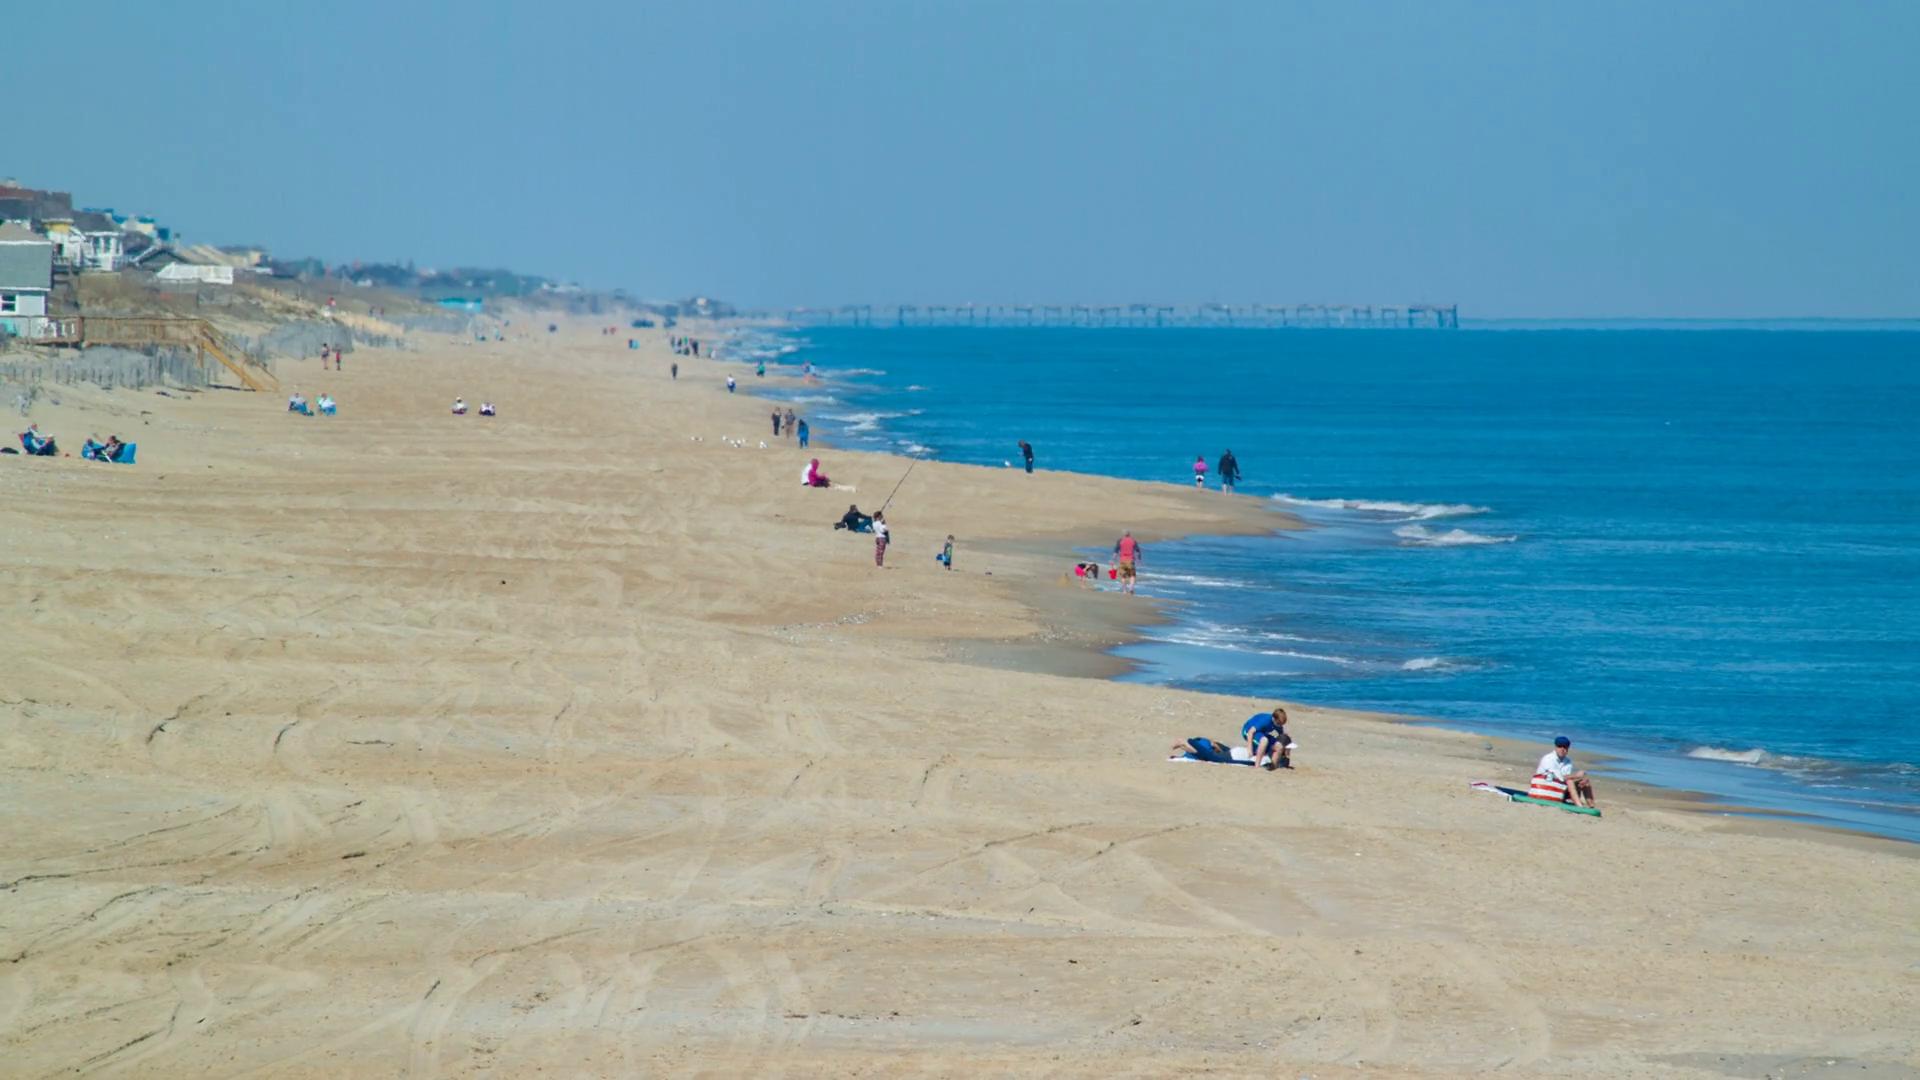 Outer Banks Visitors on Nags Head Beach in North Carolina Enjoying 1920x1080